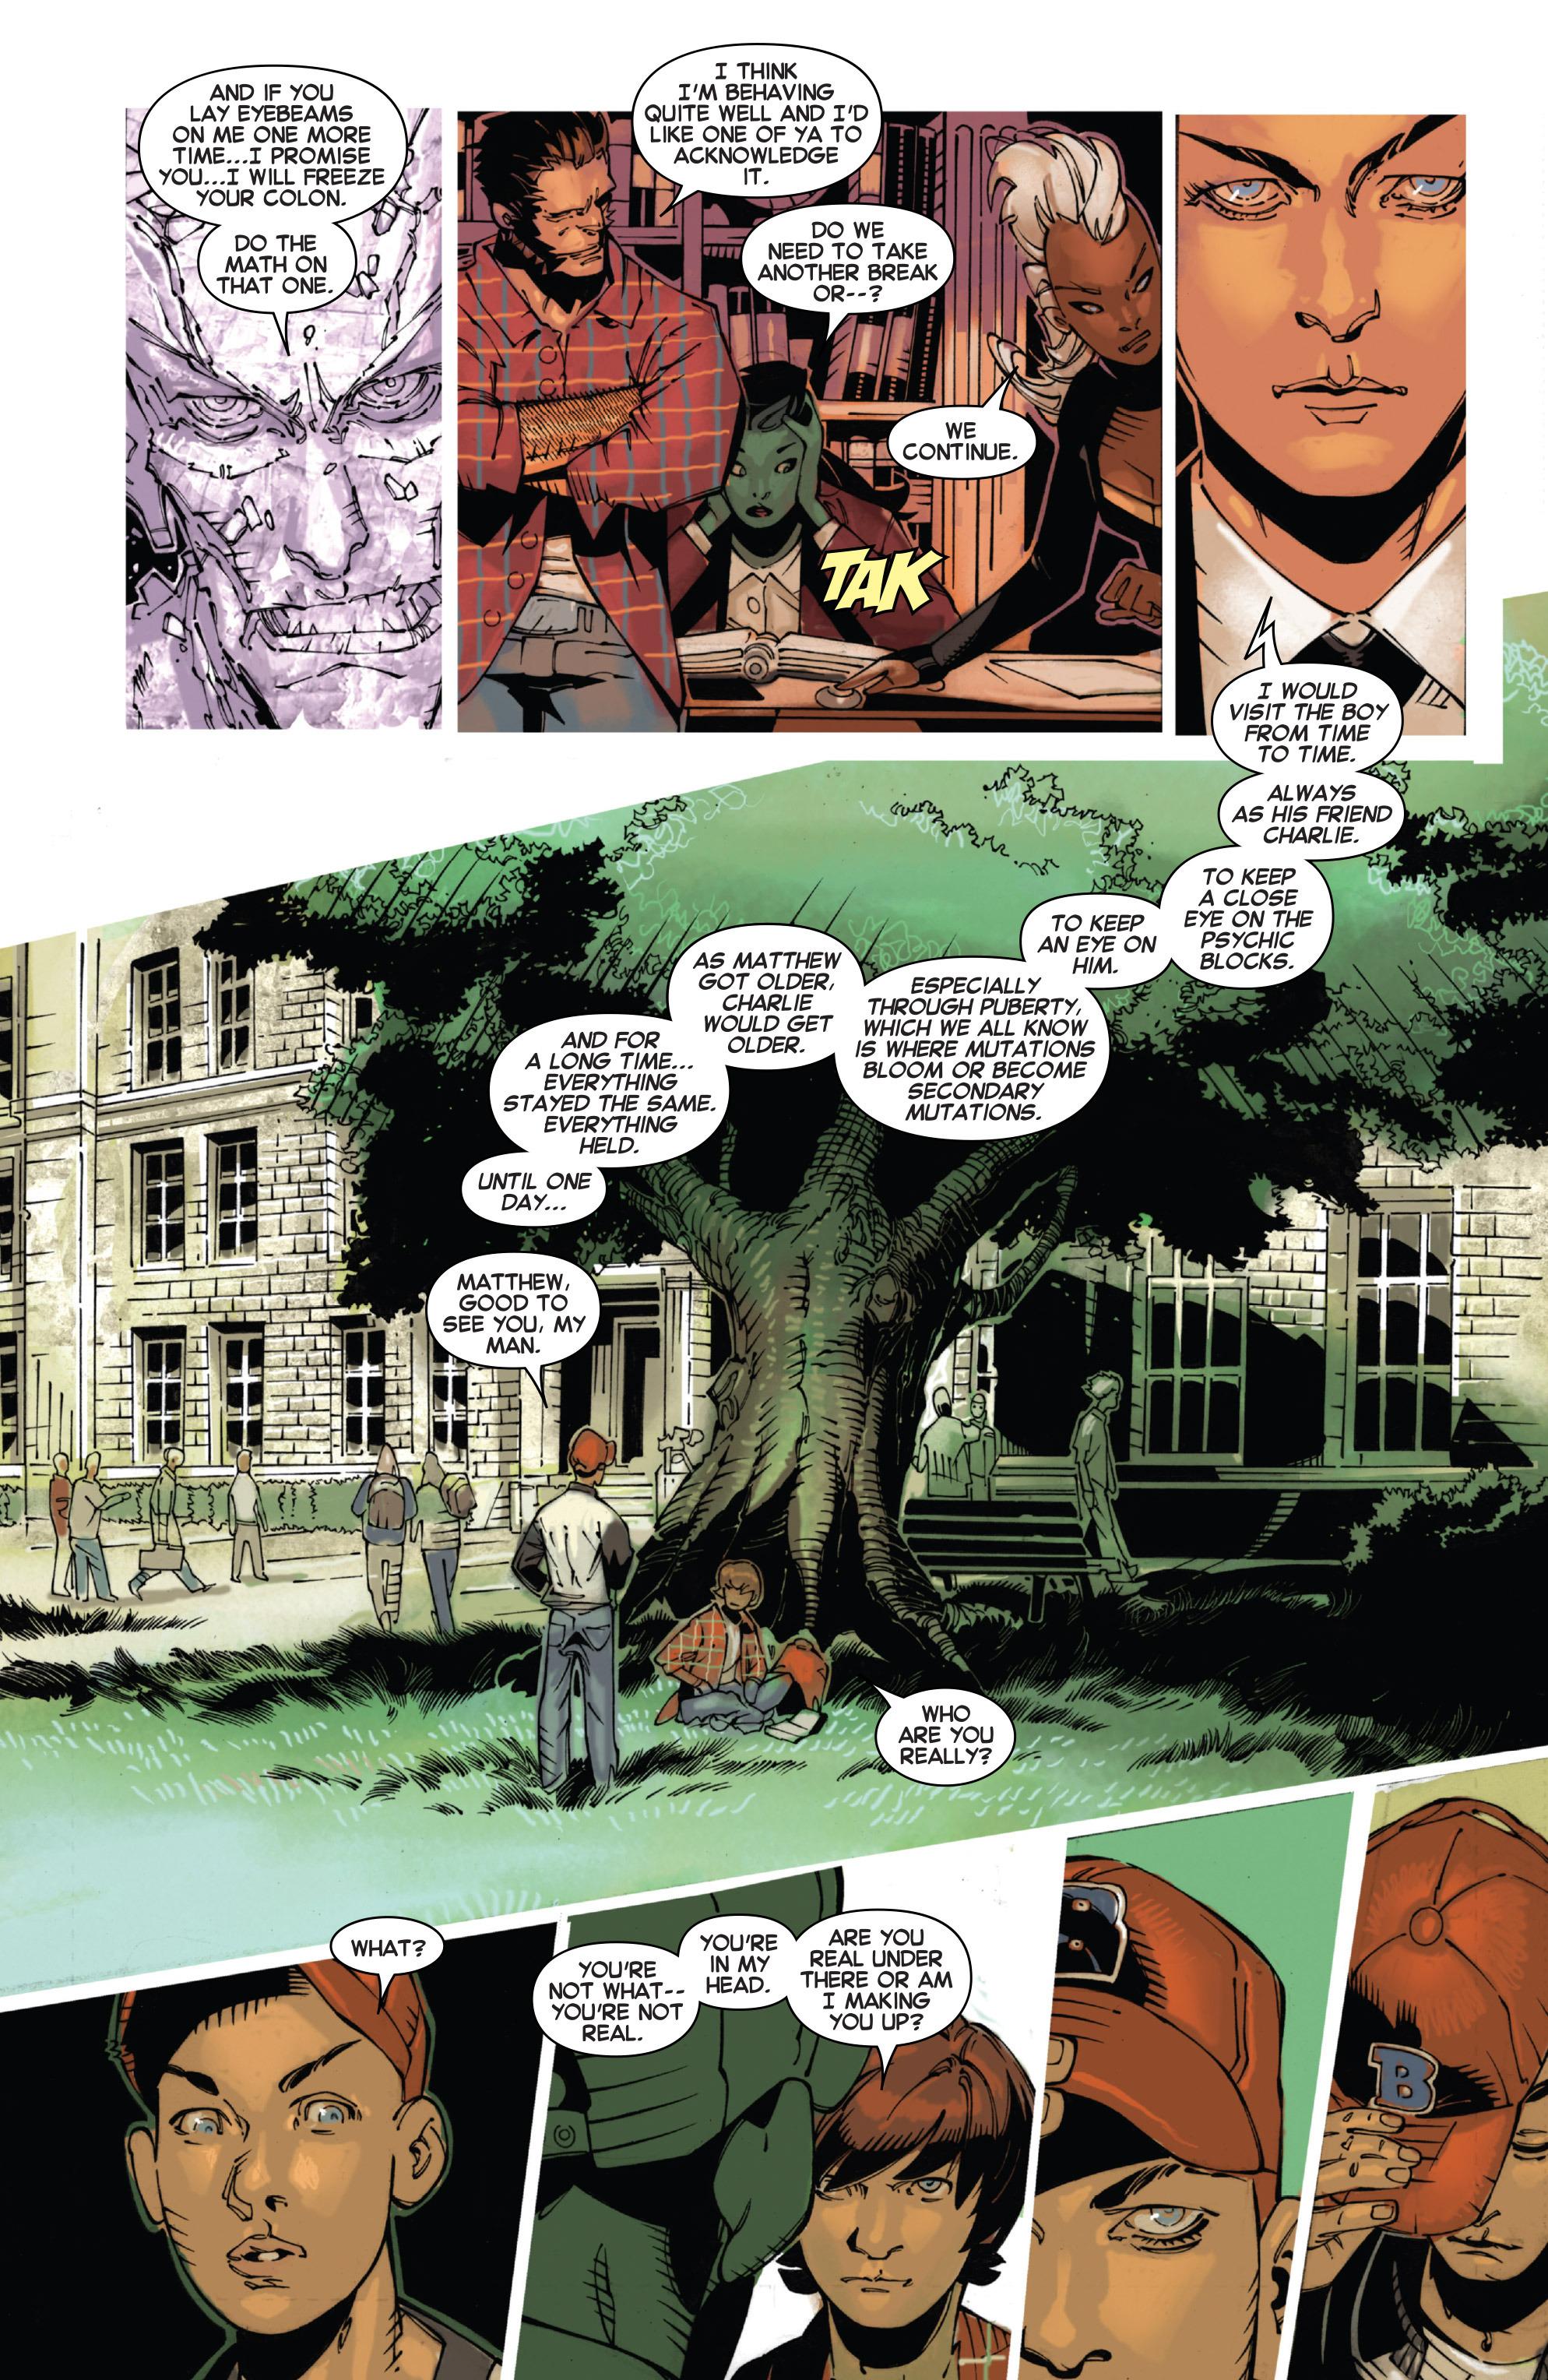 Read online Uncanny X-Men (2013) comic -  Issue # _TPB 4 - vs. S.H.I.E.L.D - 137